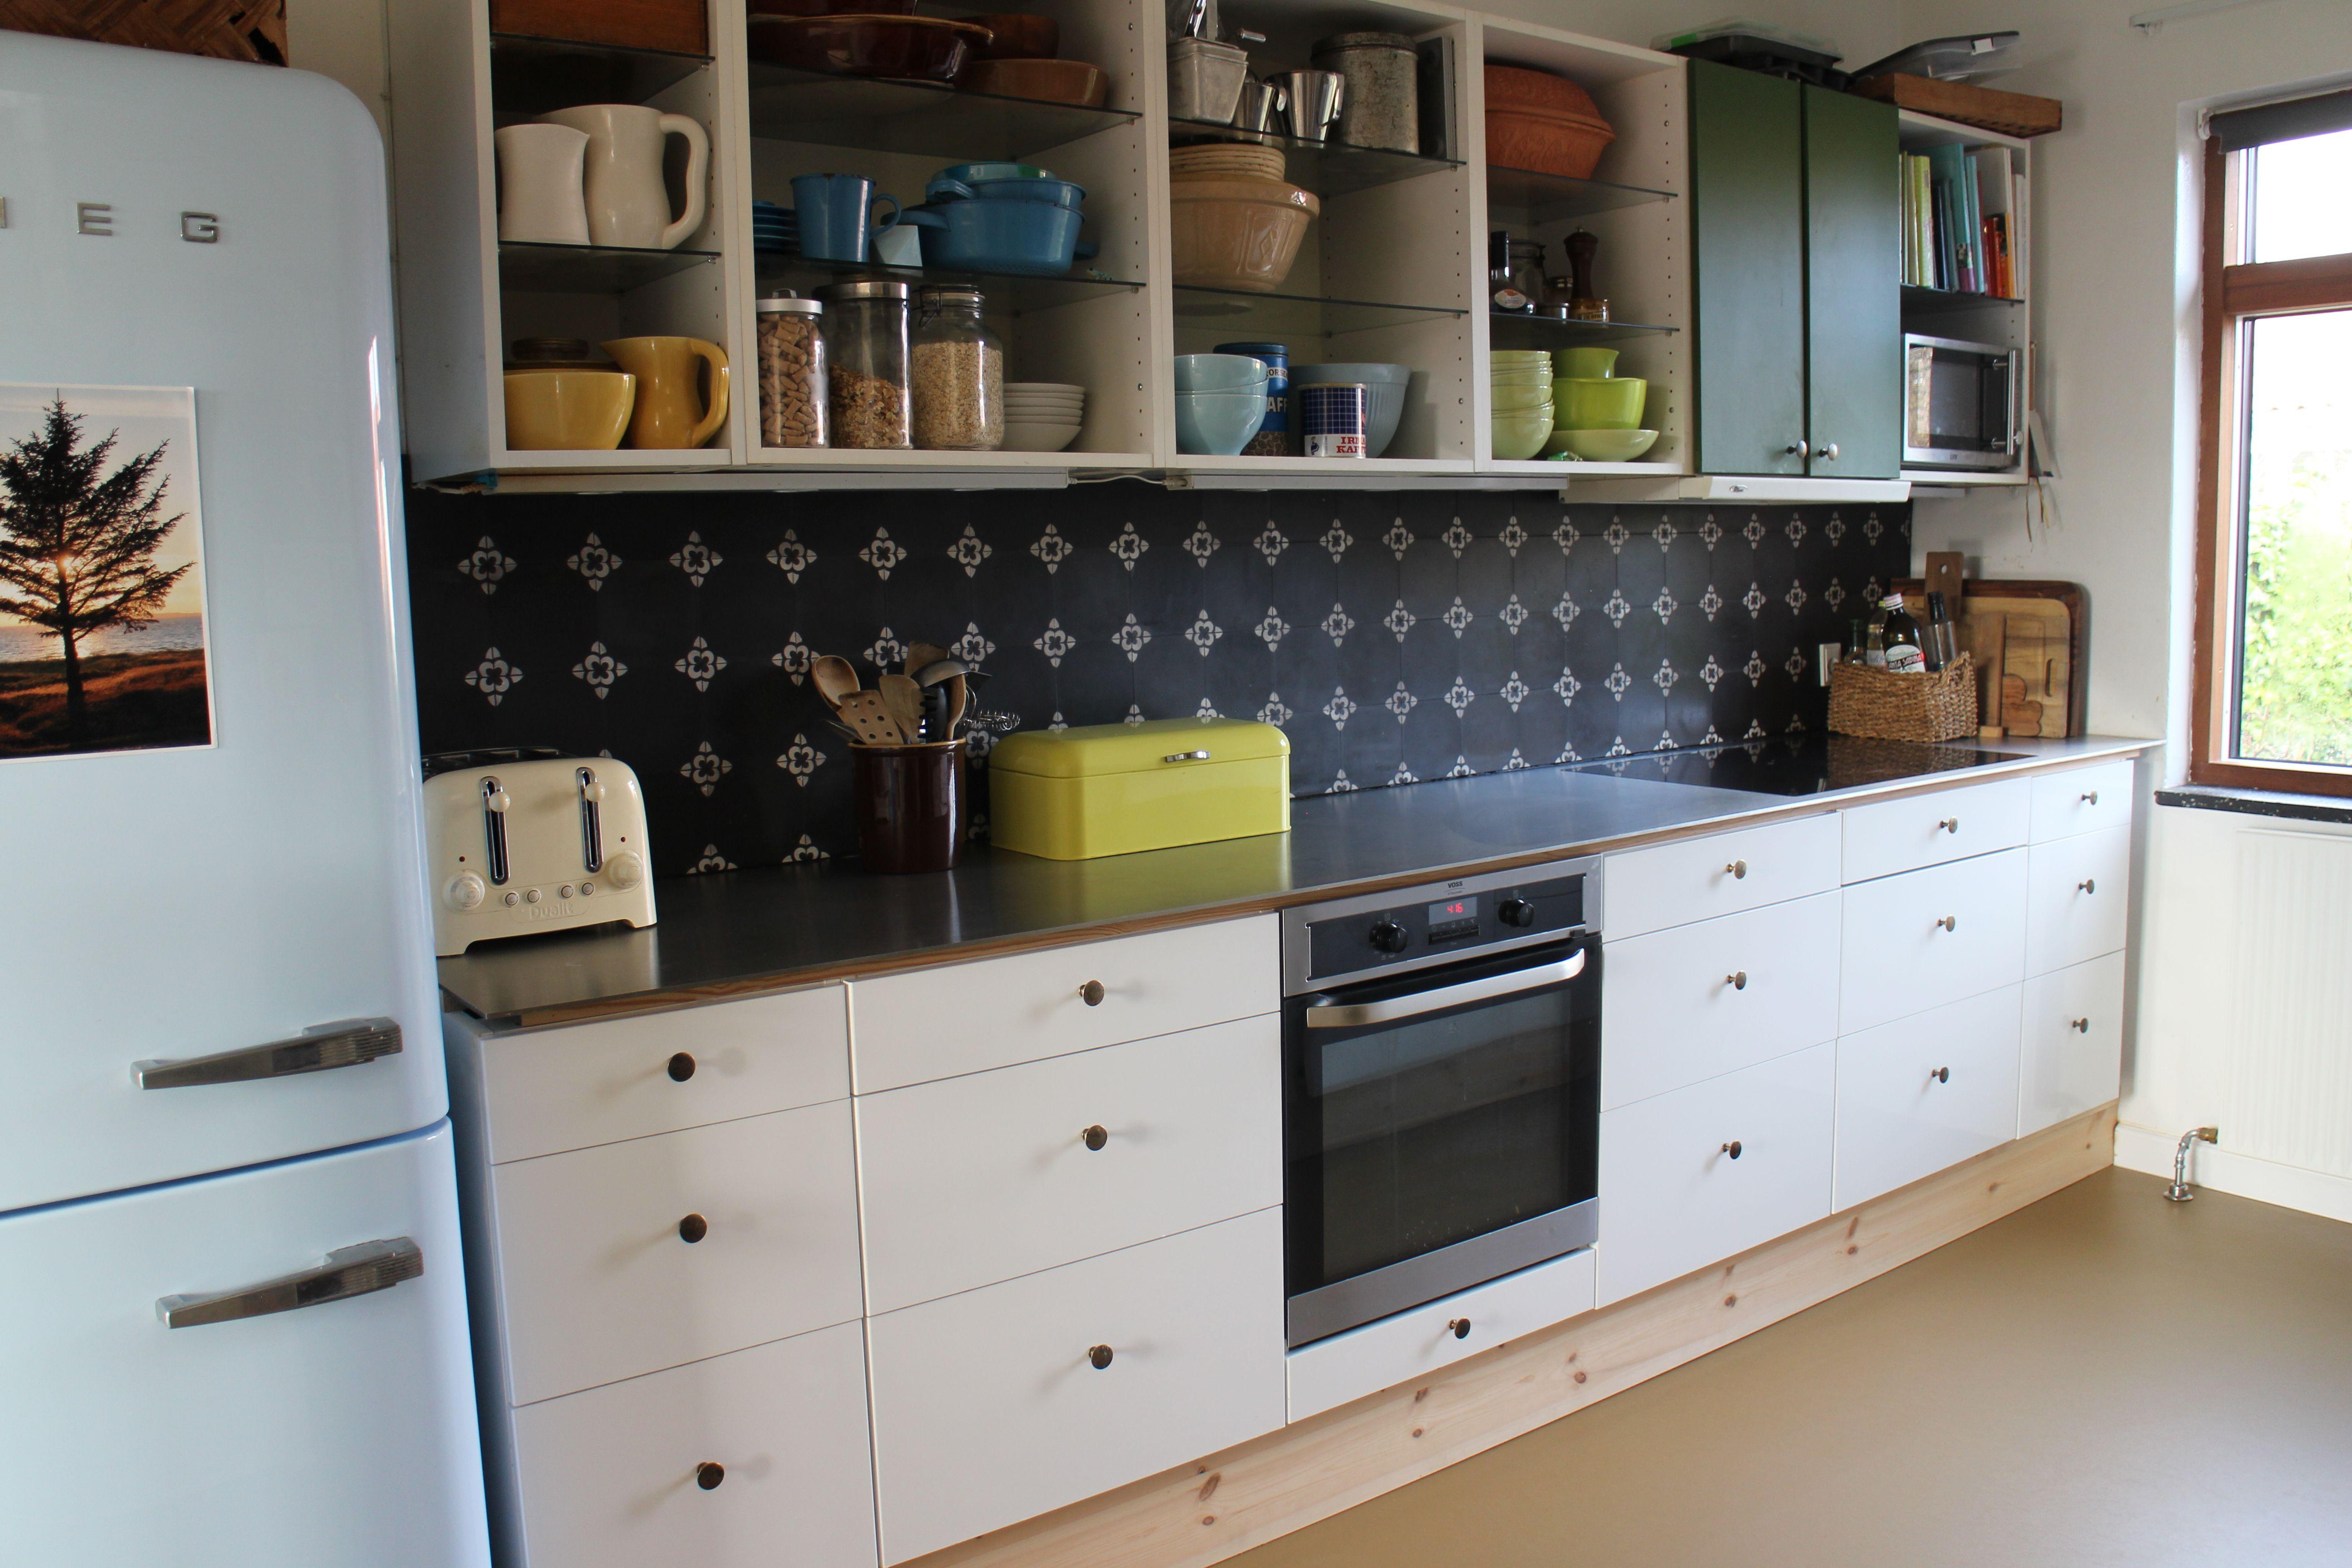 Linoleum Kitchen Floors Linoleum Marmoleum Flooring By Forbo Walton Cirrus In The